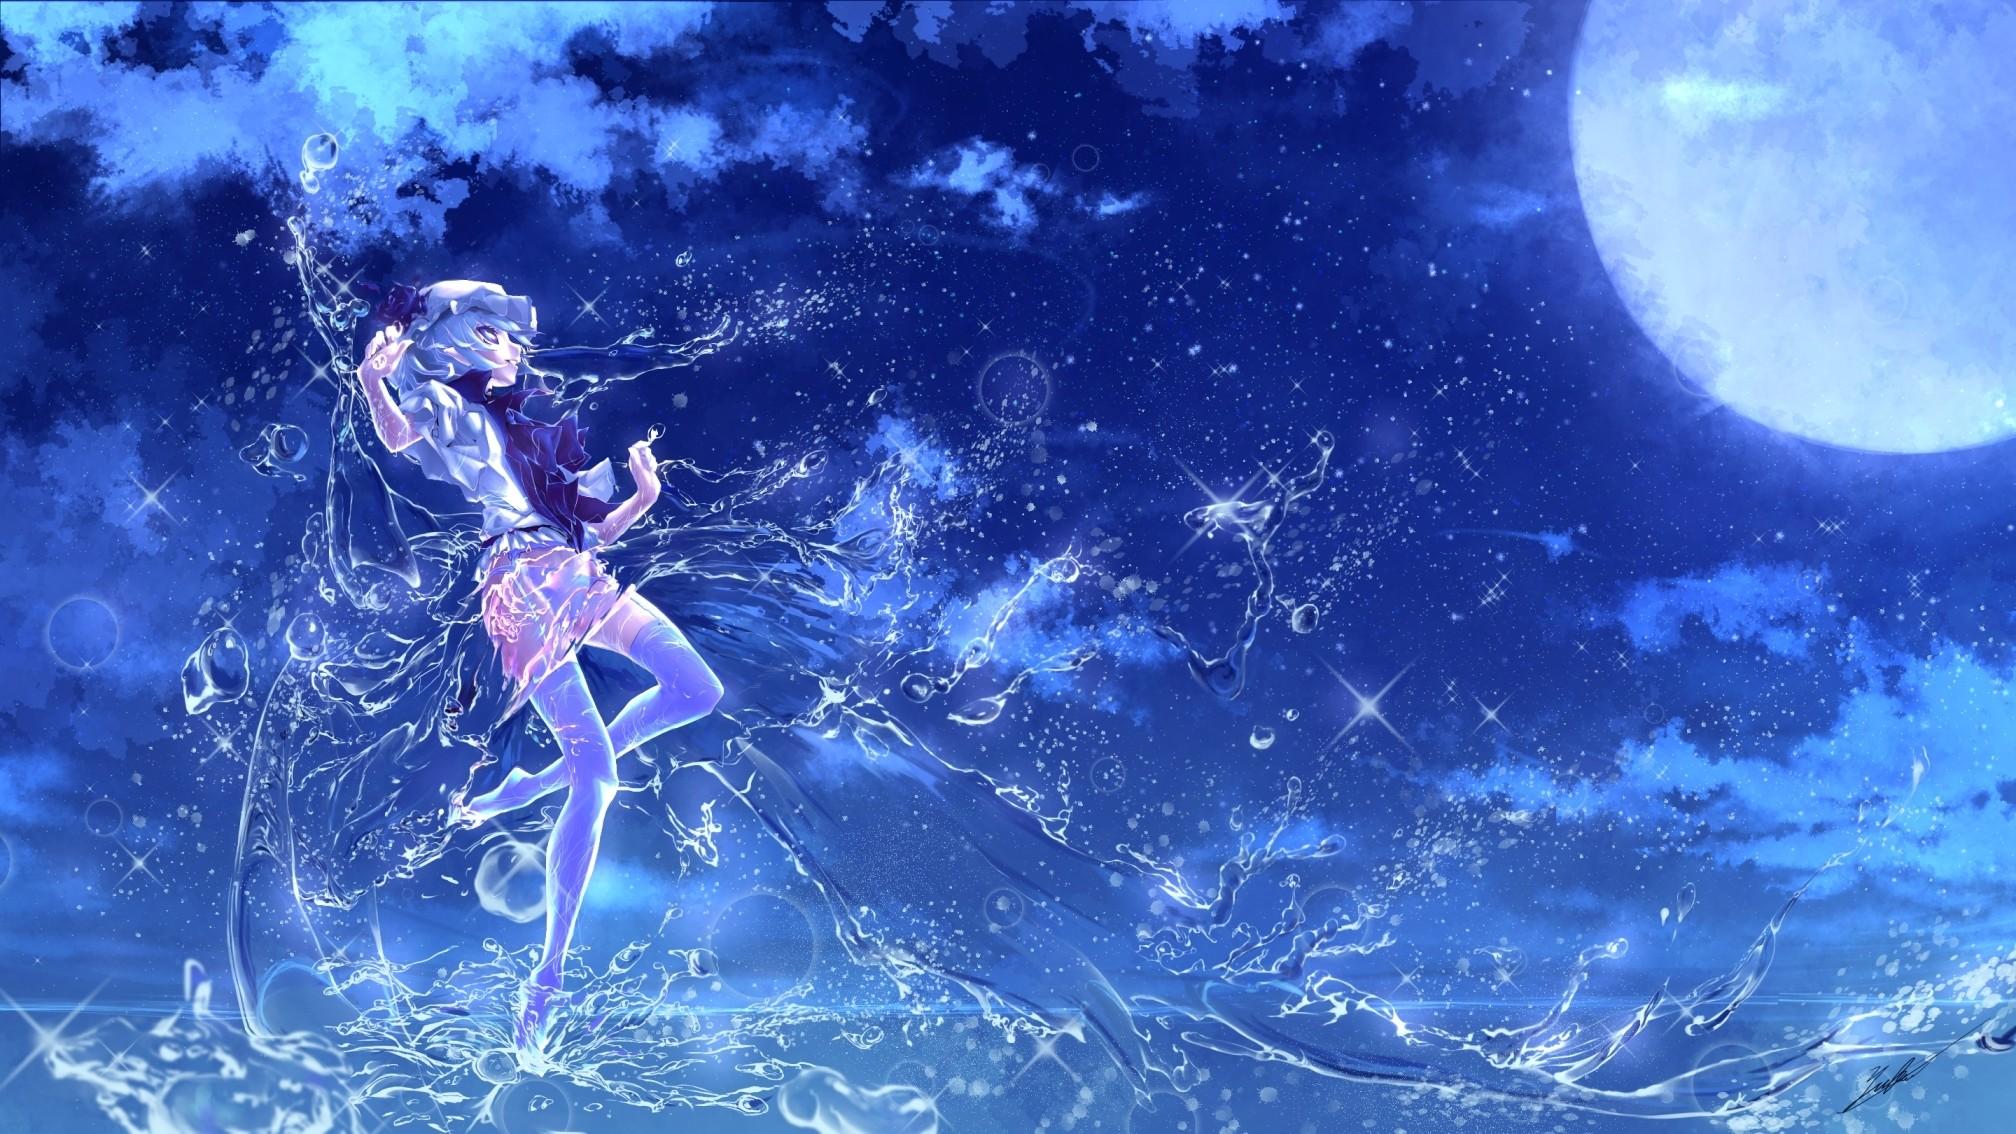 touhou, anime art, water girl, moon, glitter, background